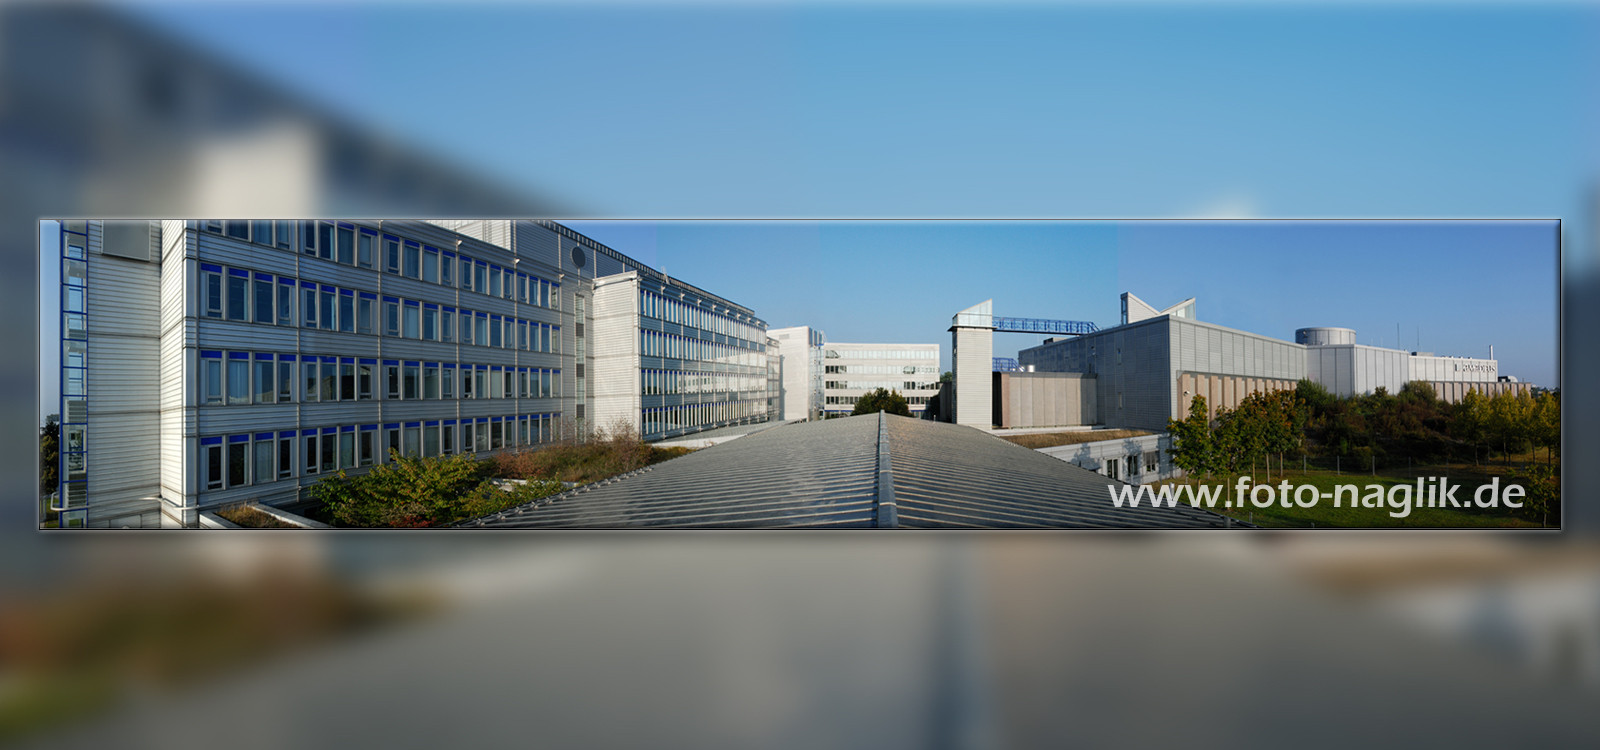 Naglik-Foto-Erding-Amadeus-Architektur-Panorama